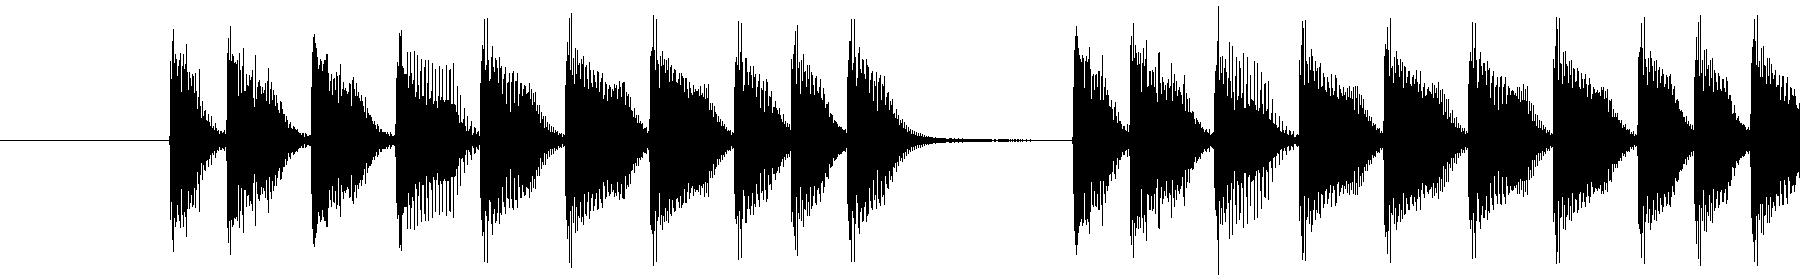 01 dh2 piano loop d 124